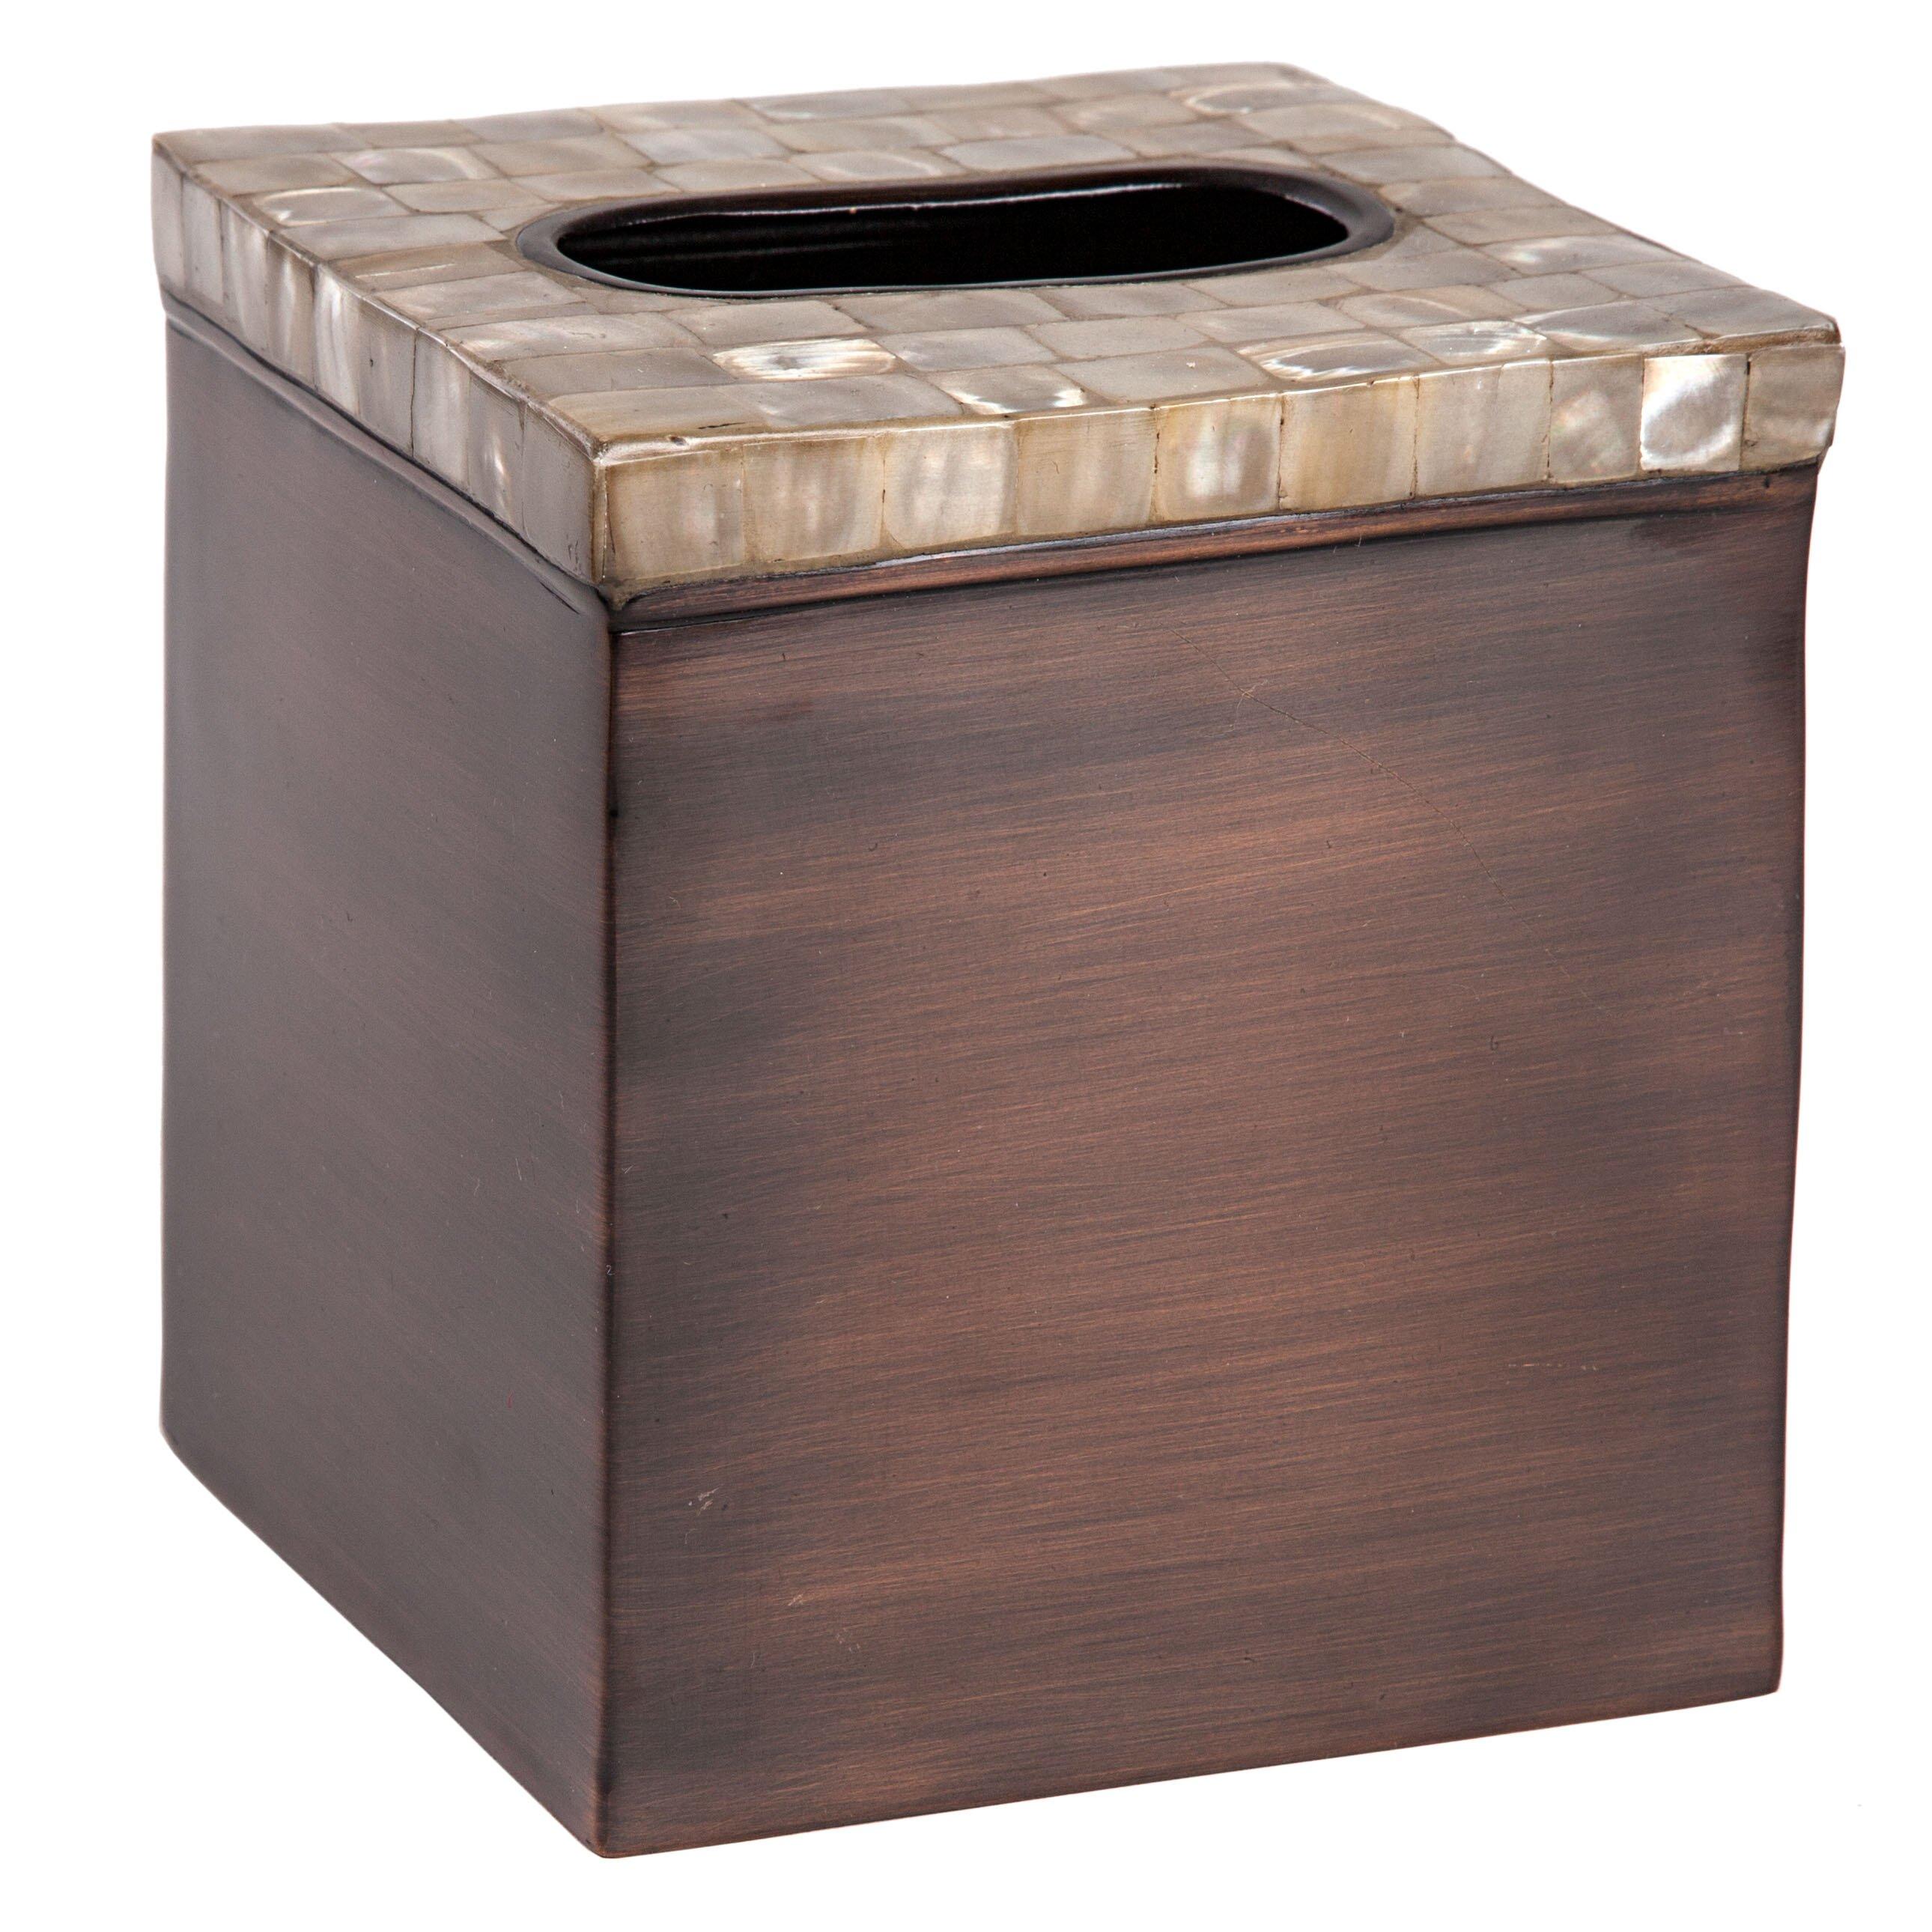 Maroon Bathroom Accessories Paradigm Trends Opal Copper 7 Piece Bathroom Accessory Set